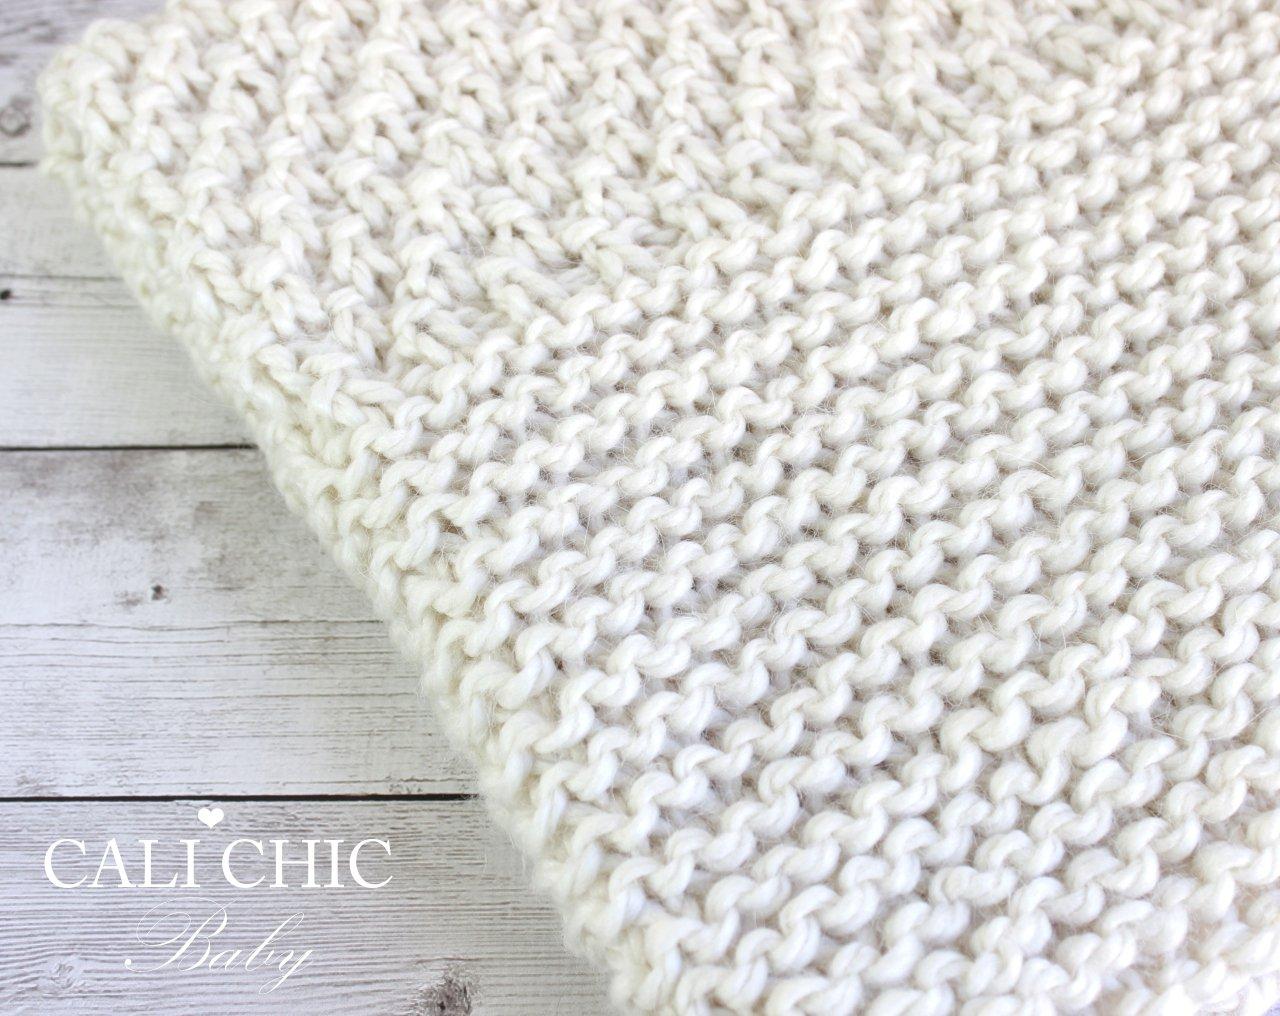 ButtercreamBeginner KnitBaby BlanketPattern 102 | Cali Chic Baby